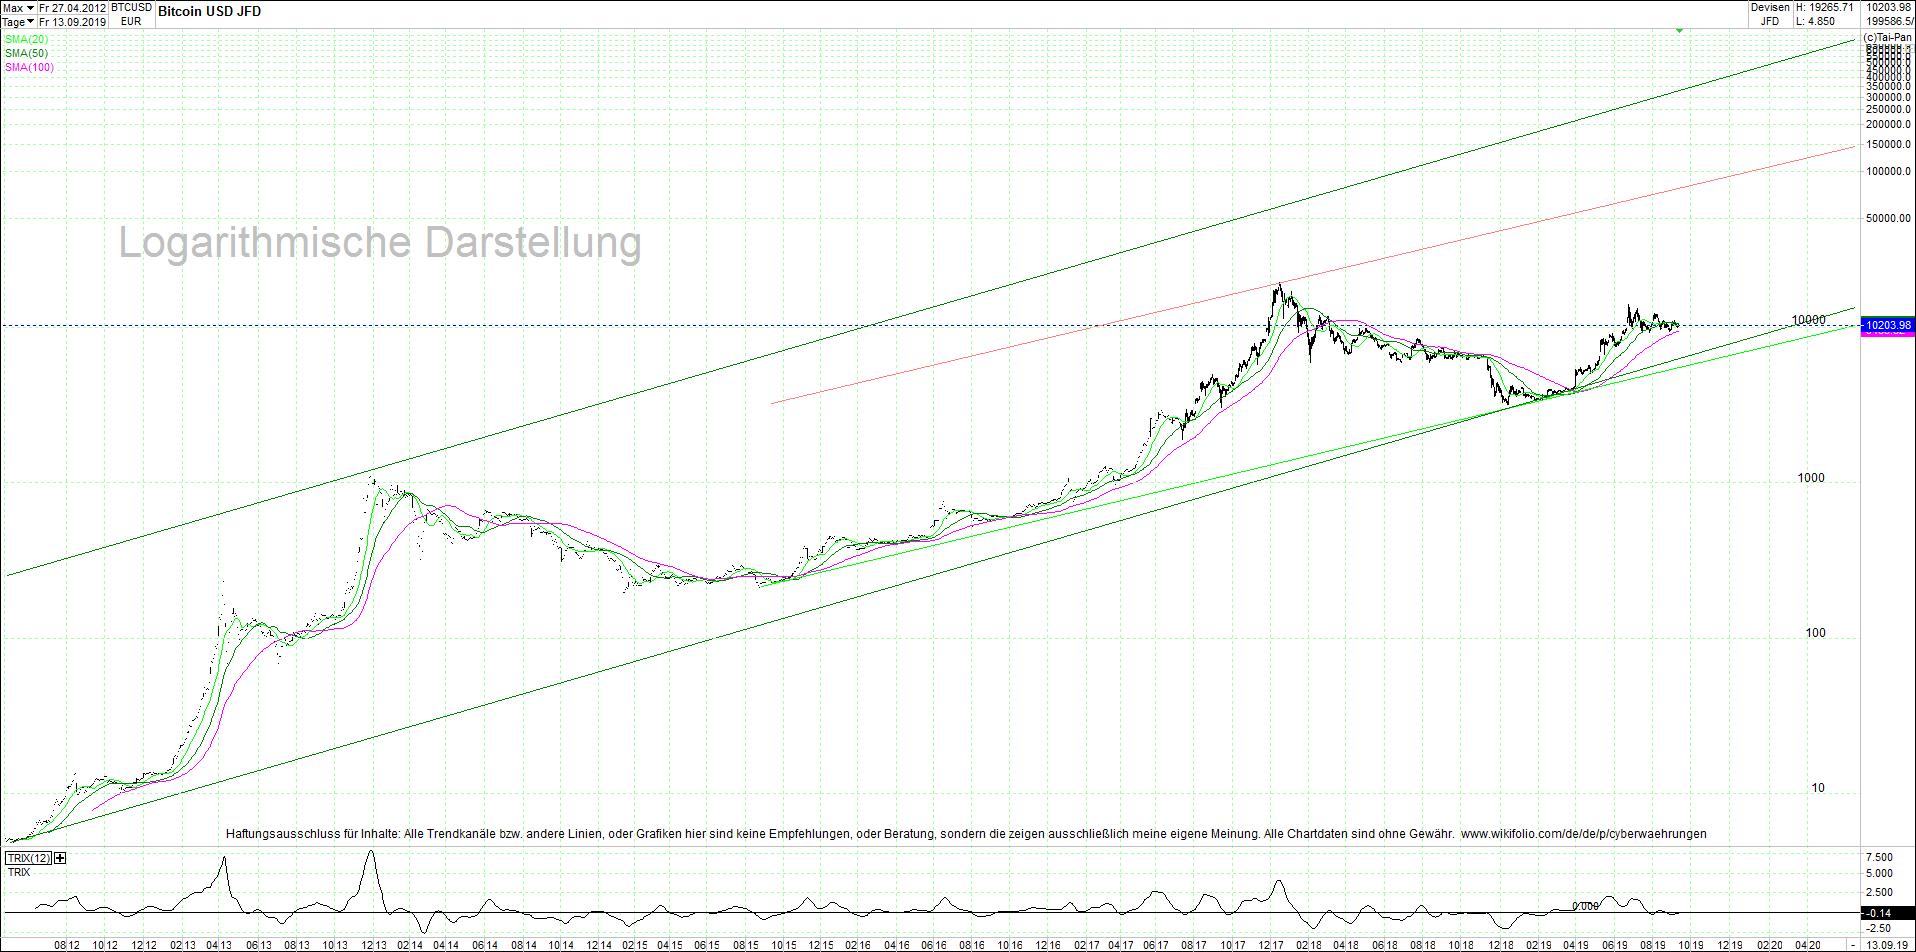 bitcoin_btc_sehr_langfristiger_chart.png